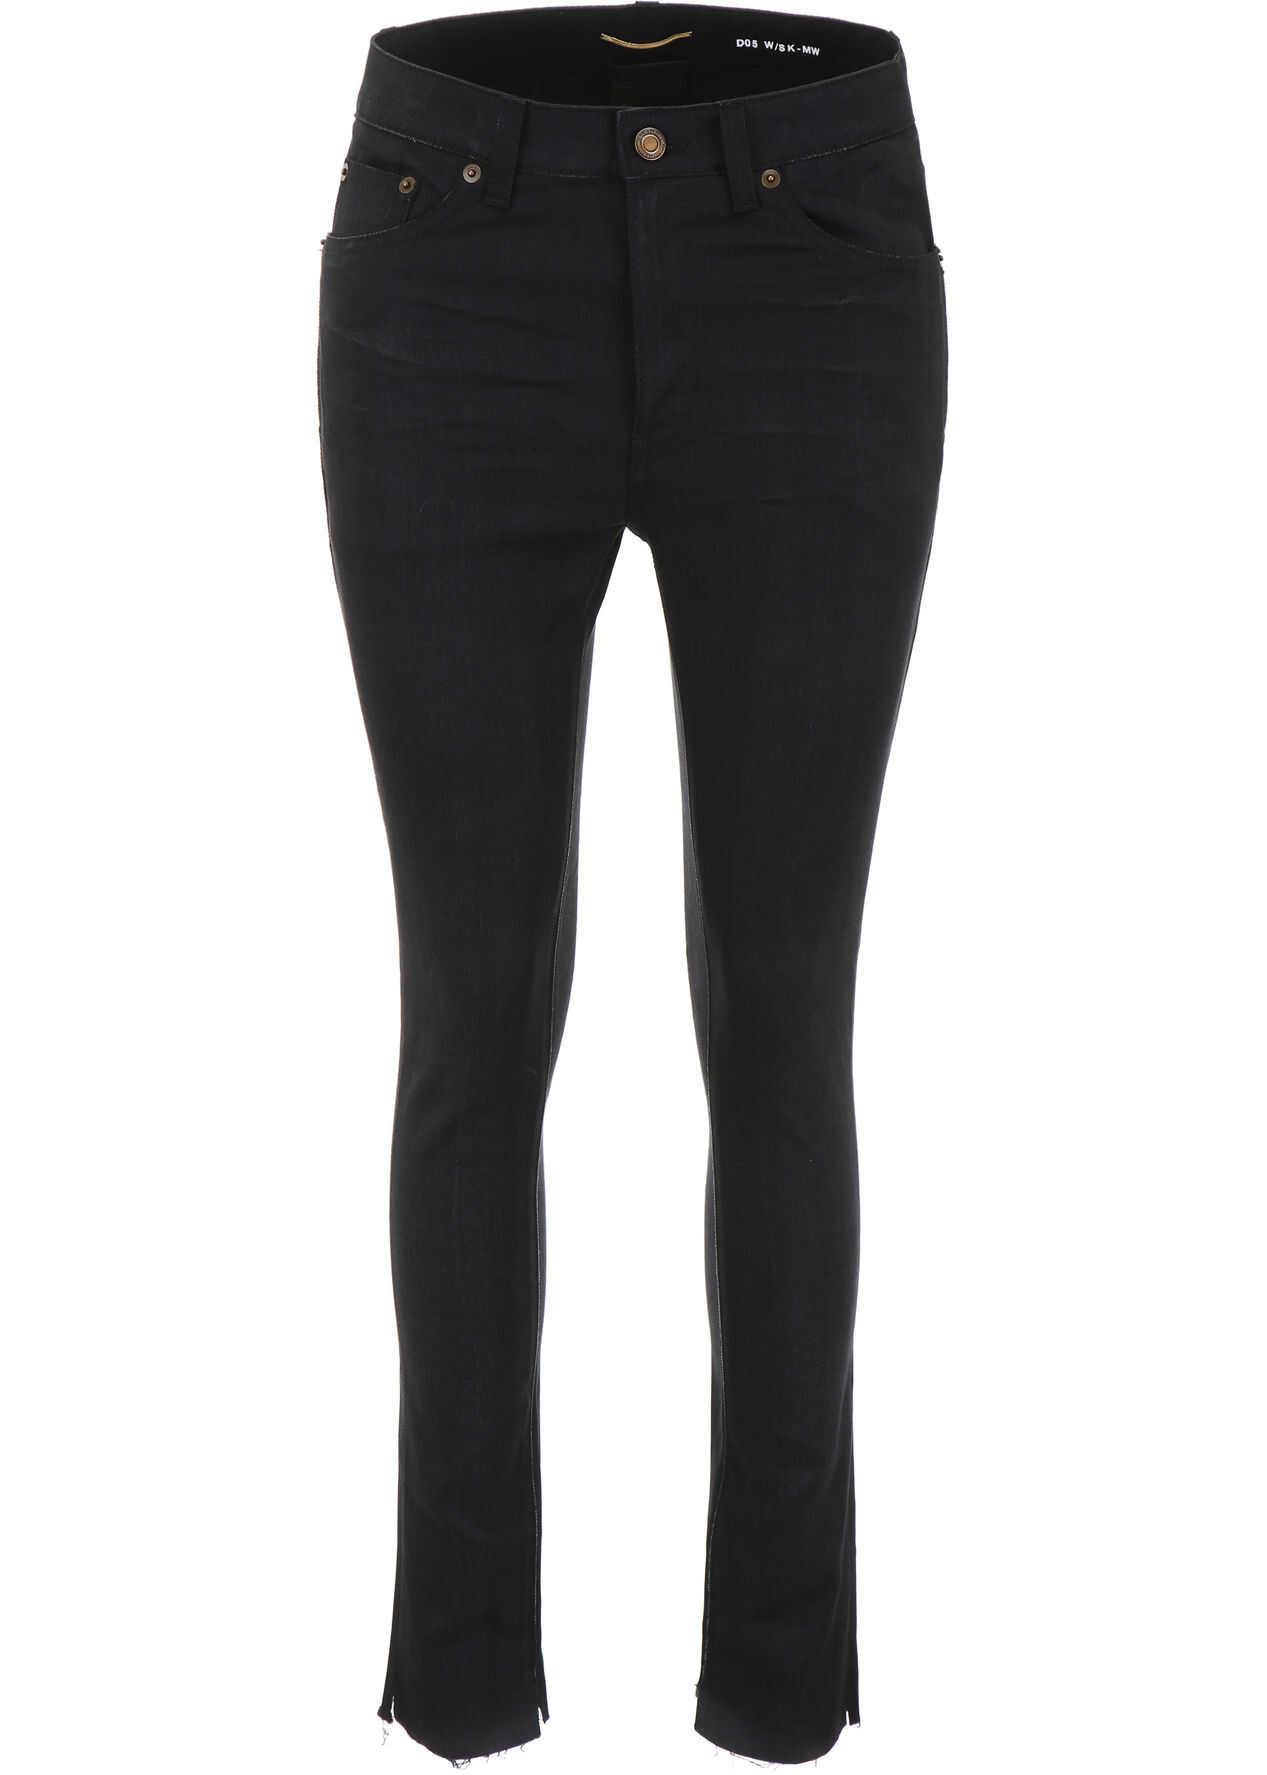 Saint Laurent Raw Cut Jeans USED BLACK